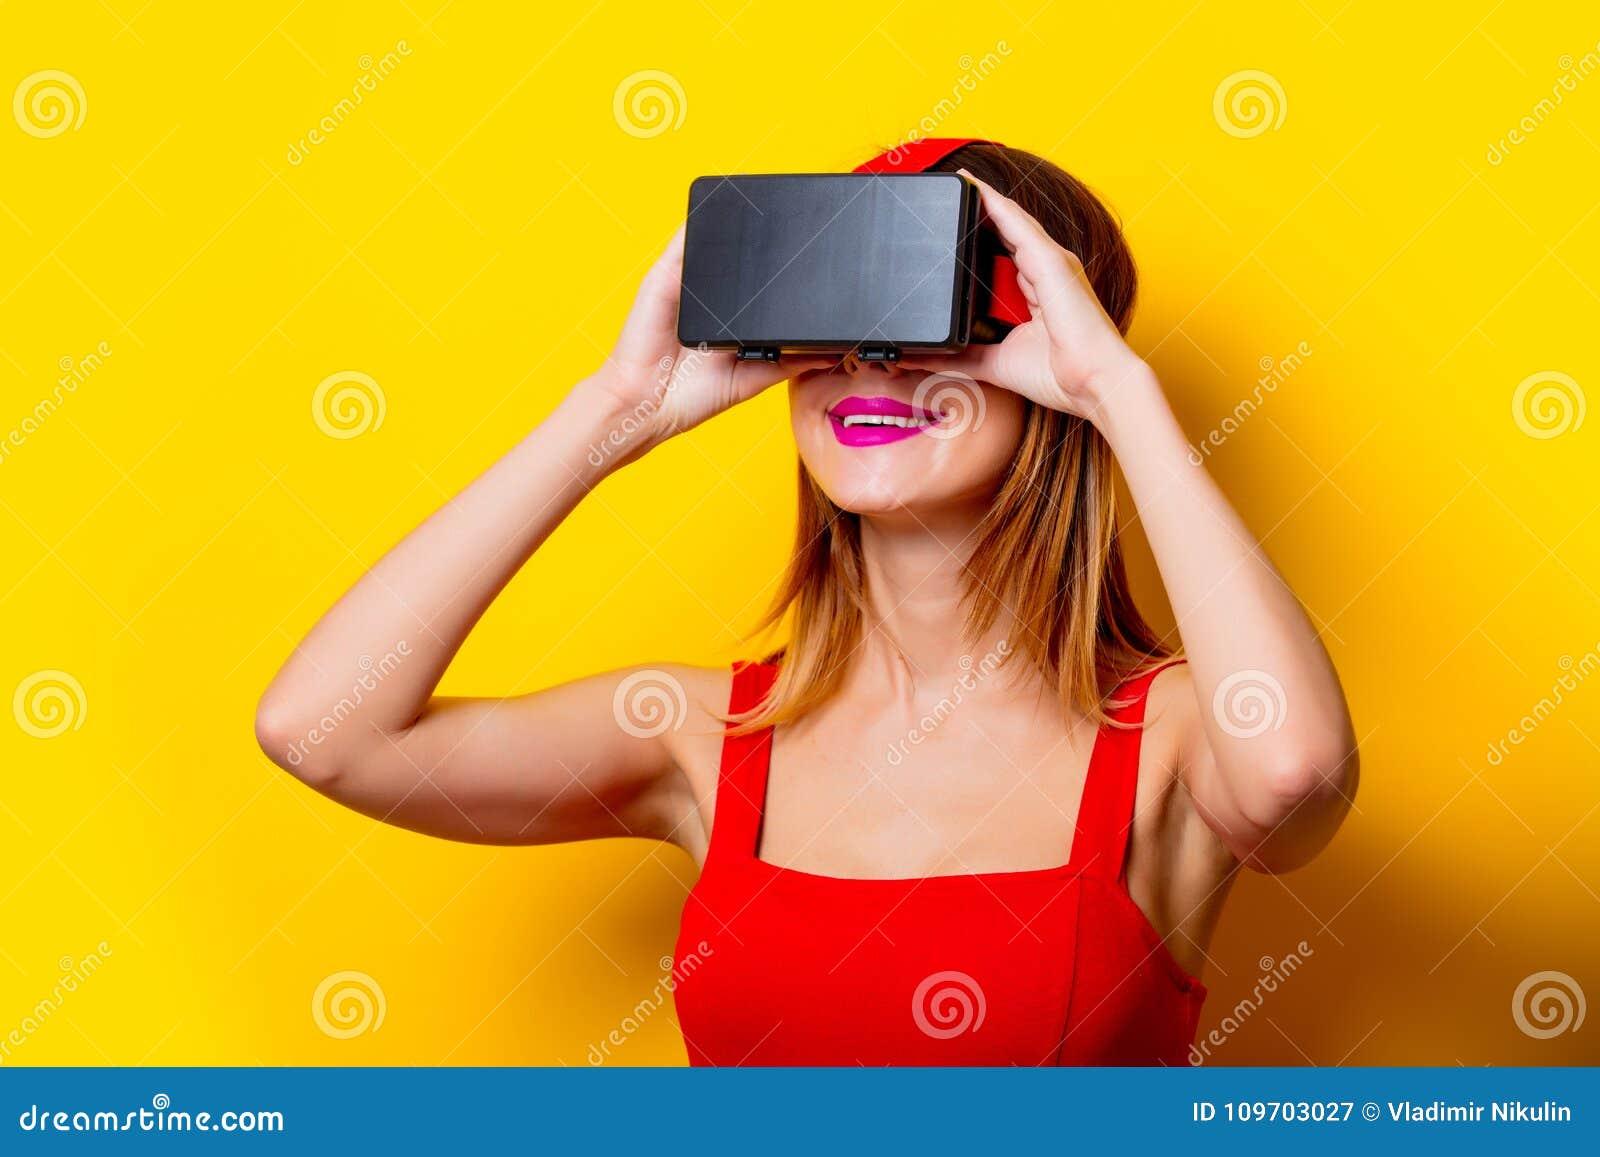 Young Girl Use Cool Virtual Reality Glasses Stock Image